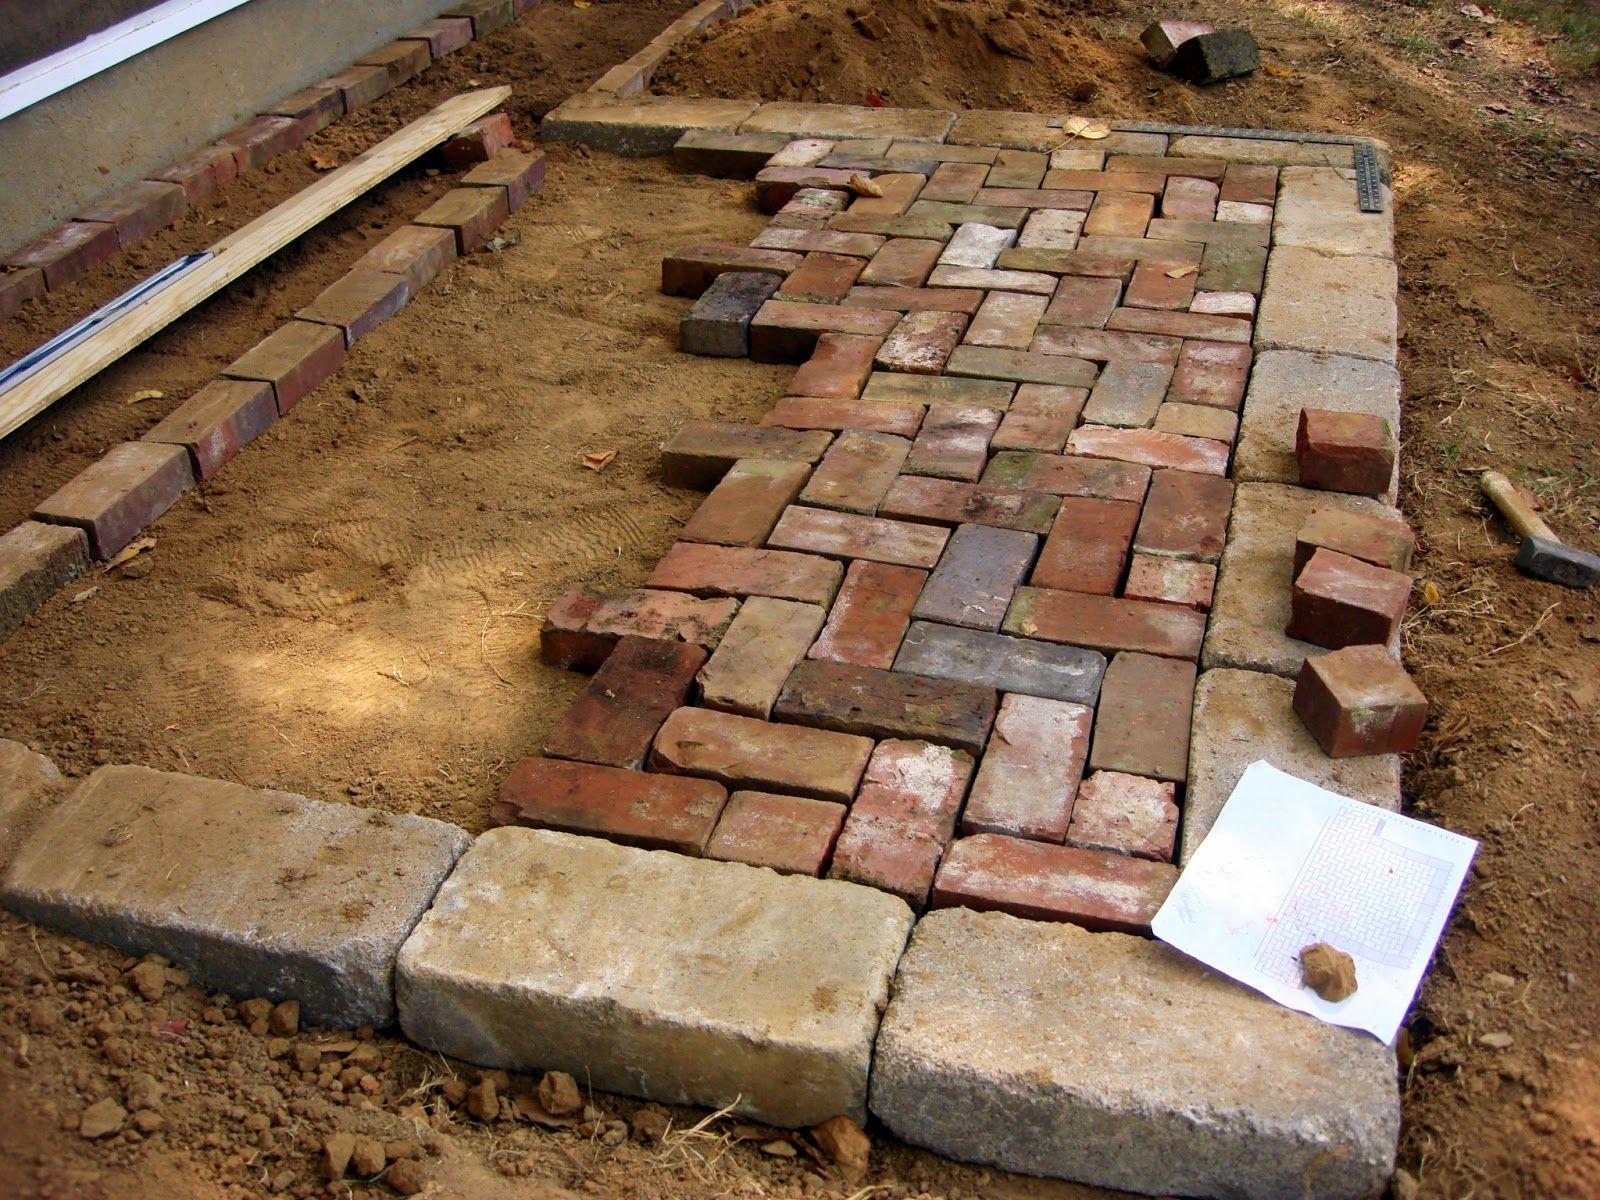 Images of 90 degree herringbone pattern paver patio